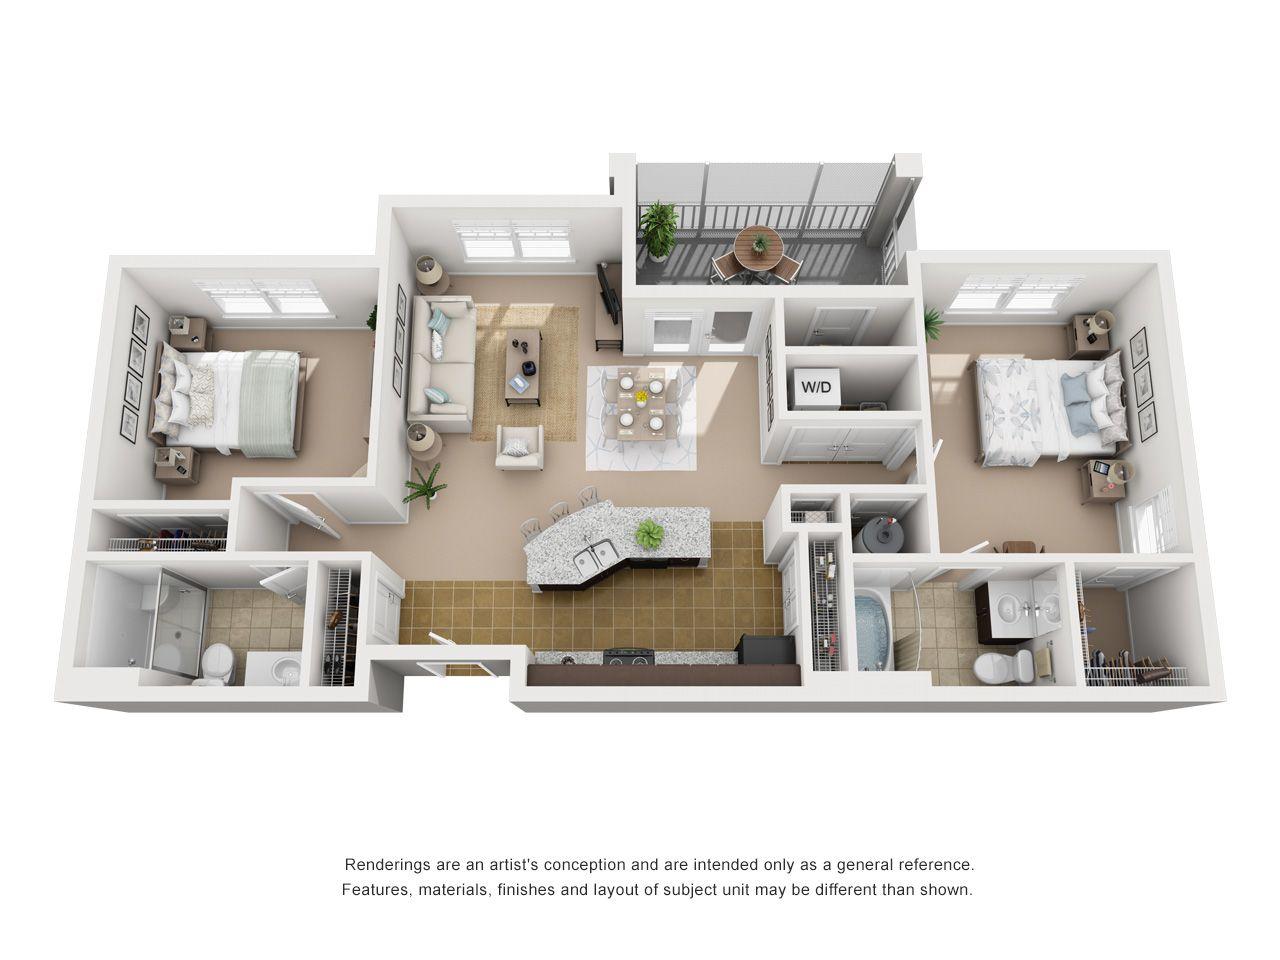 Floor Plans Cottage Trails At Culpepper Landing Apartments In Chesapeake Va Spacious Apartments Disenos De Casas Casas Disenos De Unas